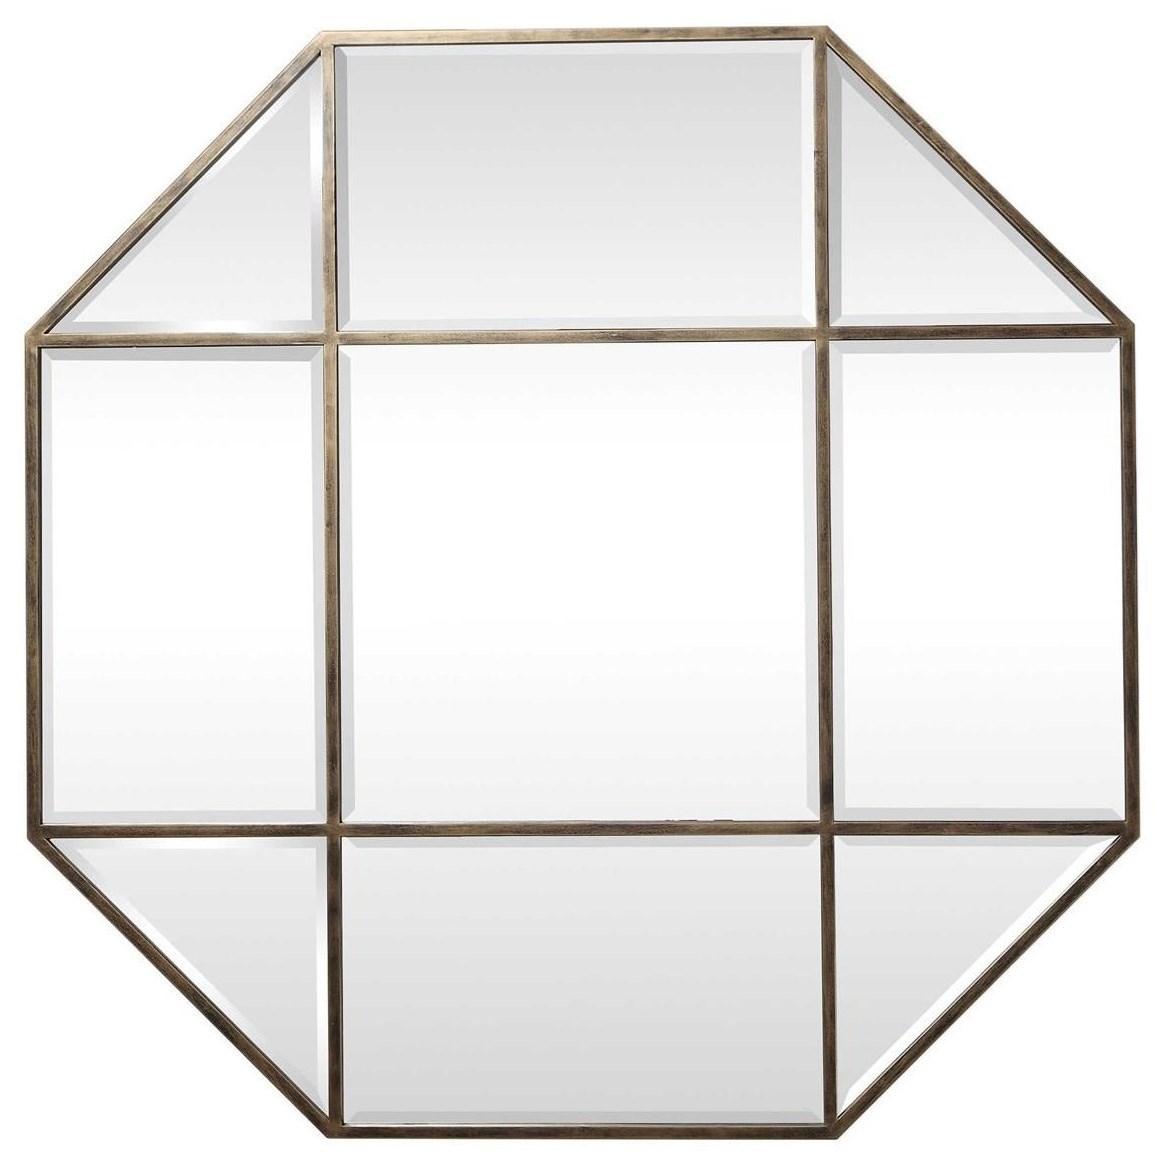 Mirrors Daniella Octagon Mirror by Uttermost at Wayside Furniture